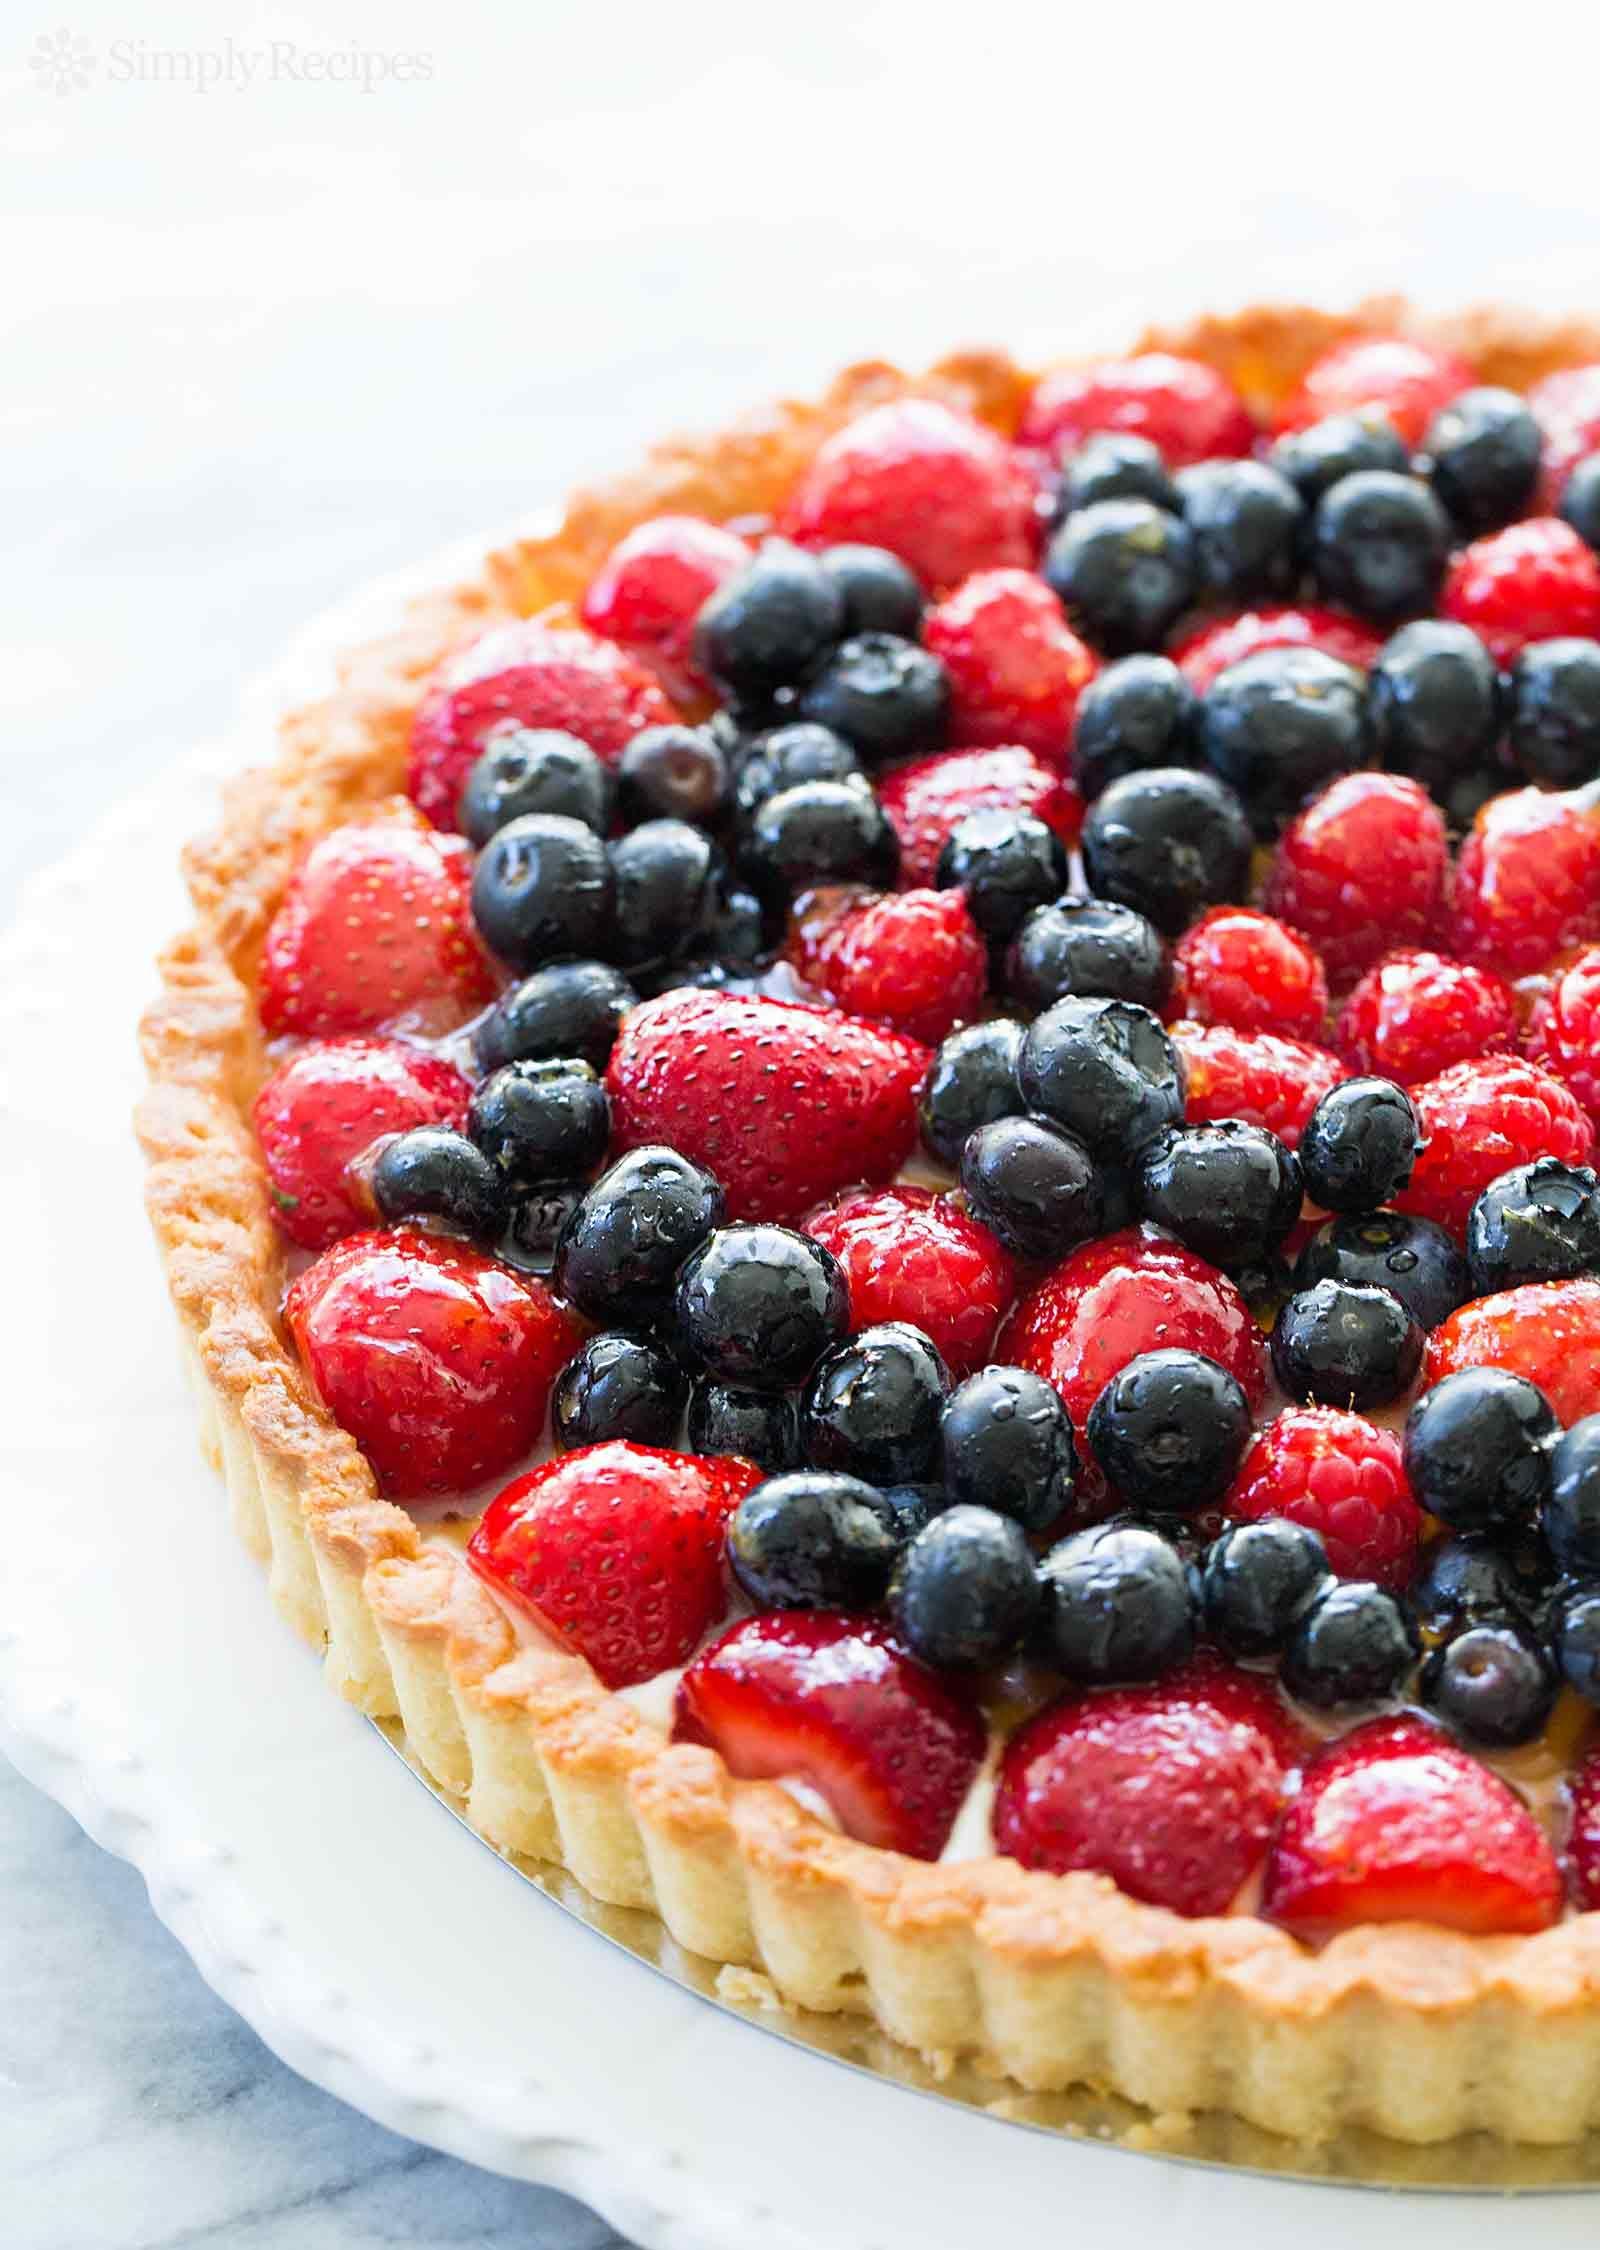 Berry Tart Recipe Fruit Tart Recipe Berry Tart Desserts